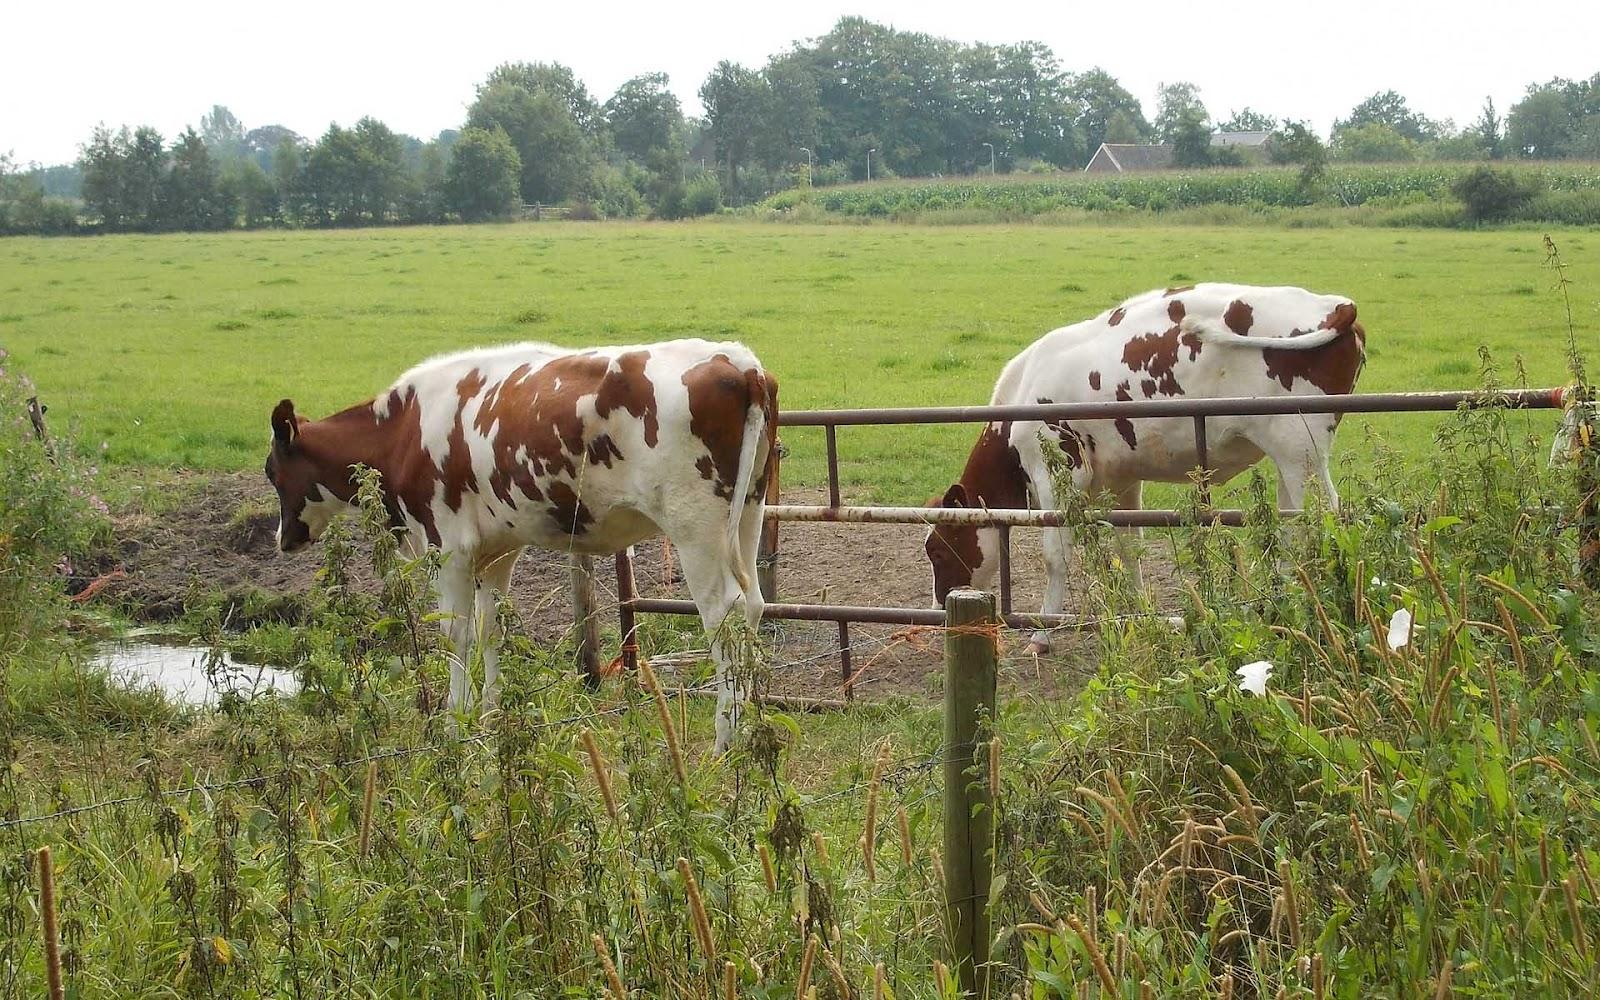 http://4.bp.blogspot.com/-8lFNTAcr8-w/UDaTuyJZUlI/AAAAAAAAA9o/p2rrFgWWpn4/s1600/hd-red-holstein-frisian-cows-wallpaper-photo-of-dutch-cows-background-picture.jpg